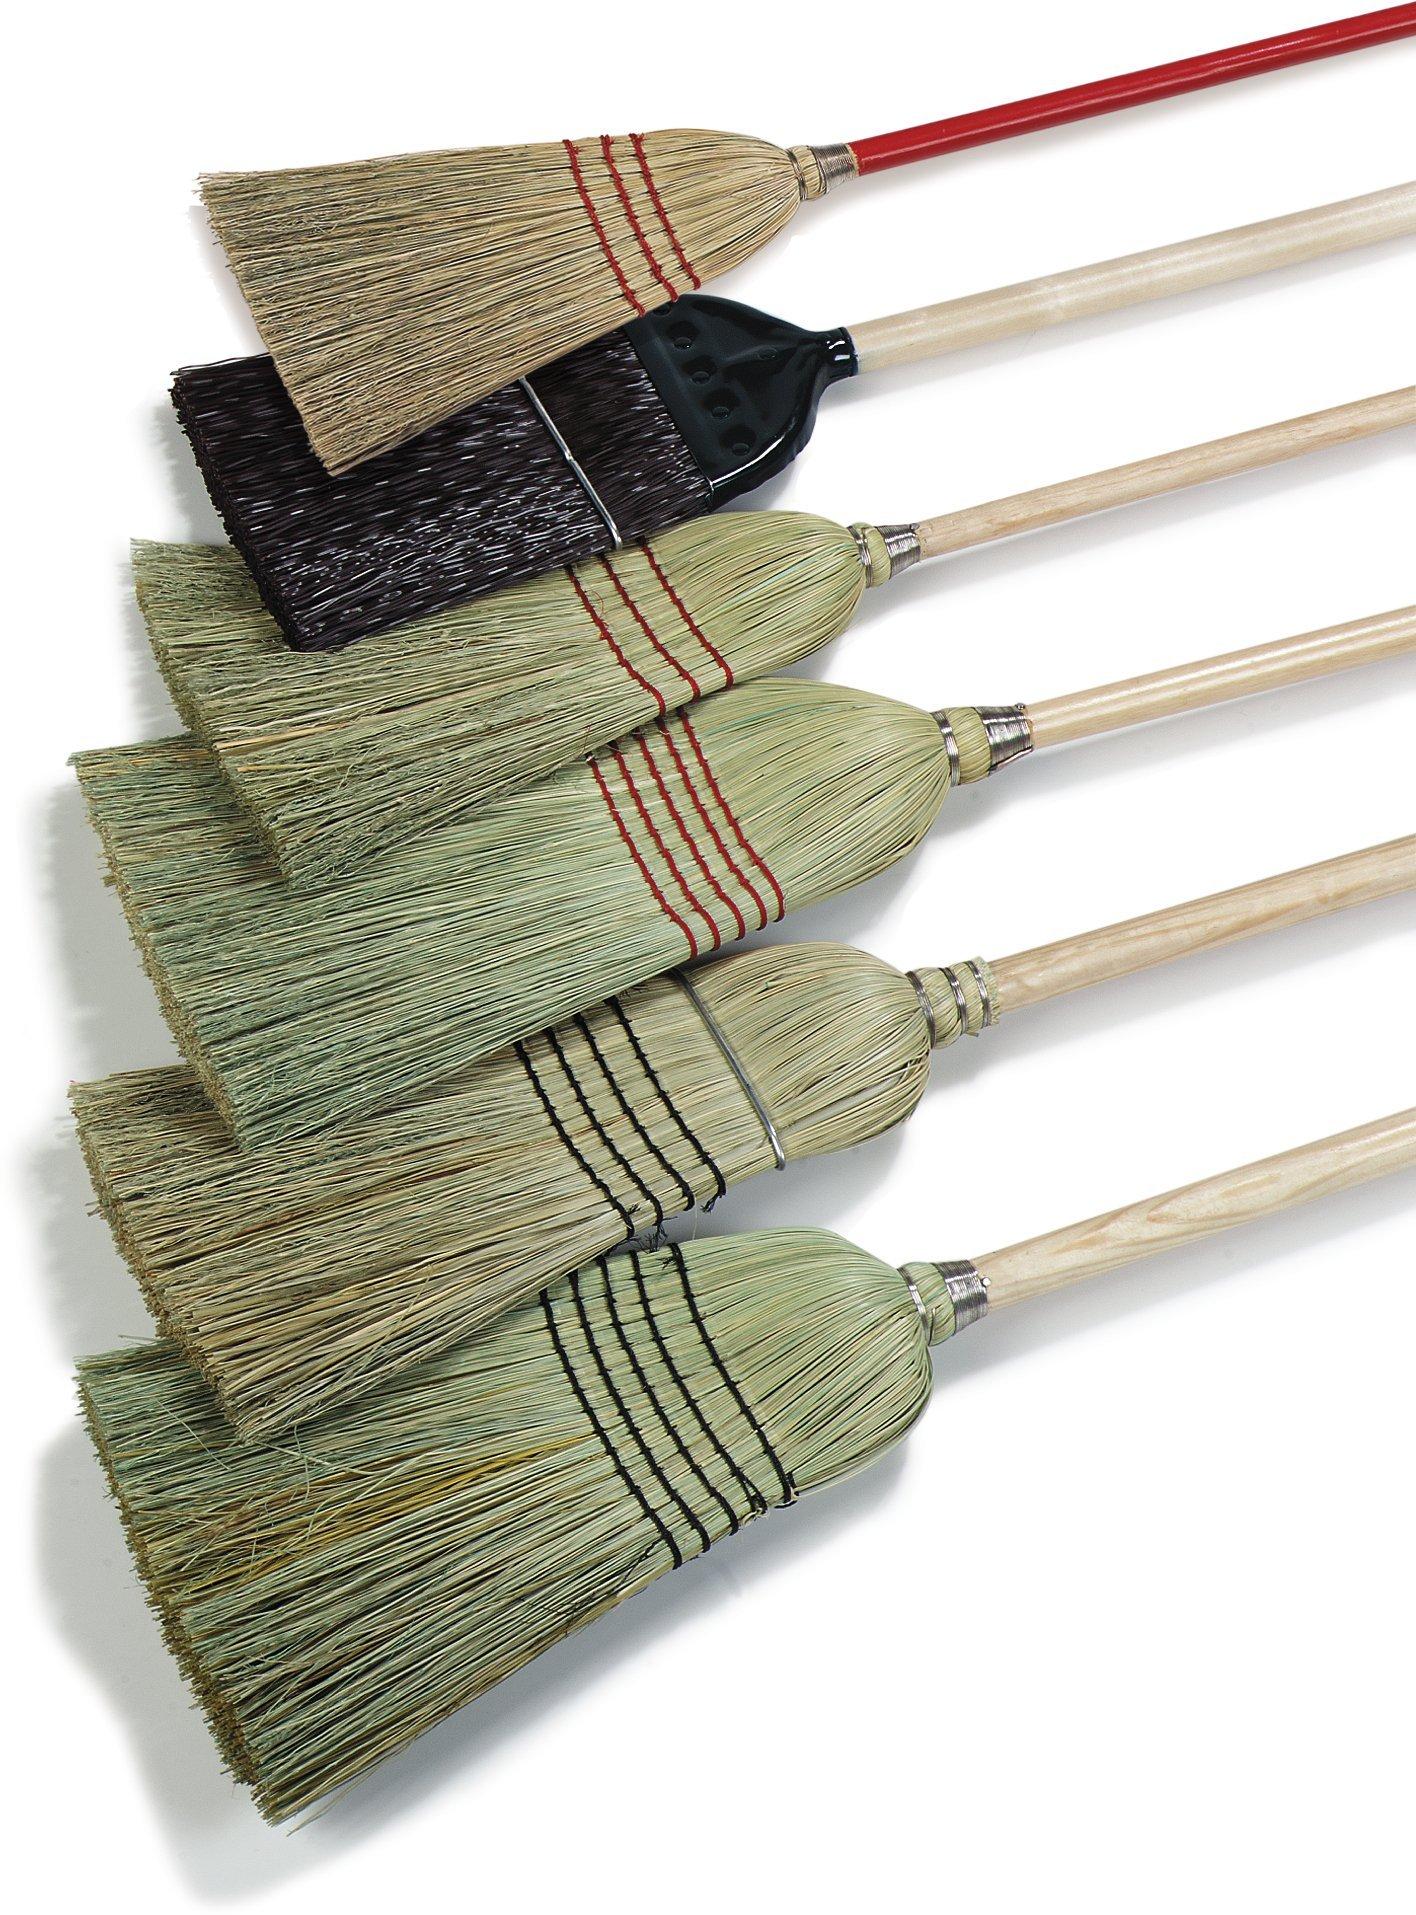 Carlisle 4063400 5-Stitch Janitor Broom, Corn Bristles, #26 Fill, 12'' Width x 13'' Trim Bristle, 56'' Overall Length (Case of 6) by Carlisle